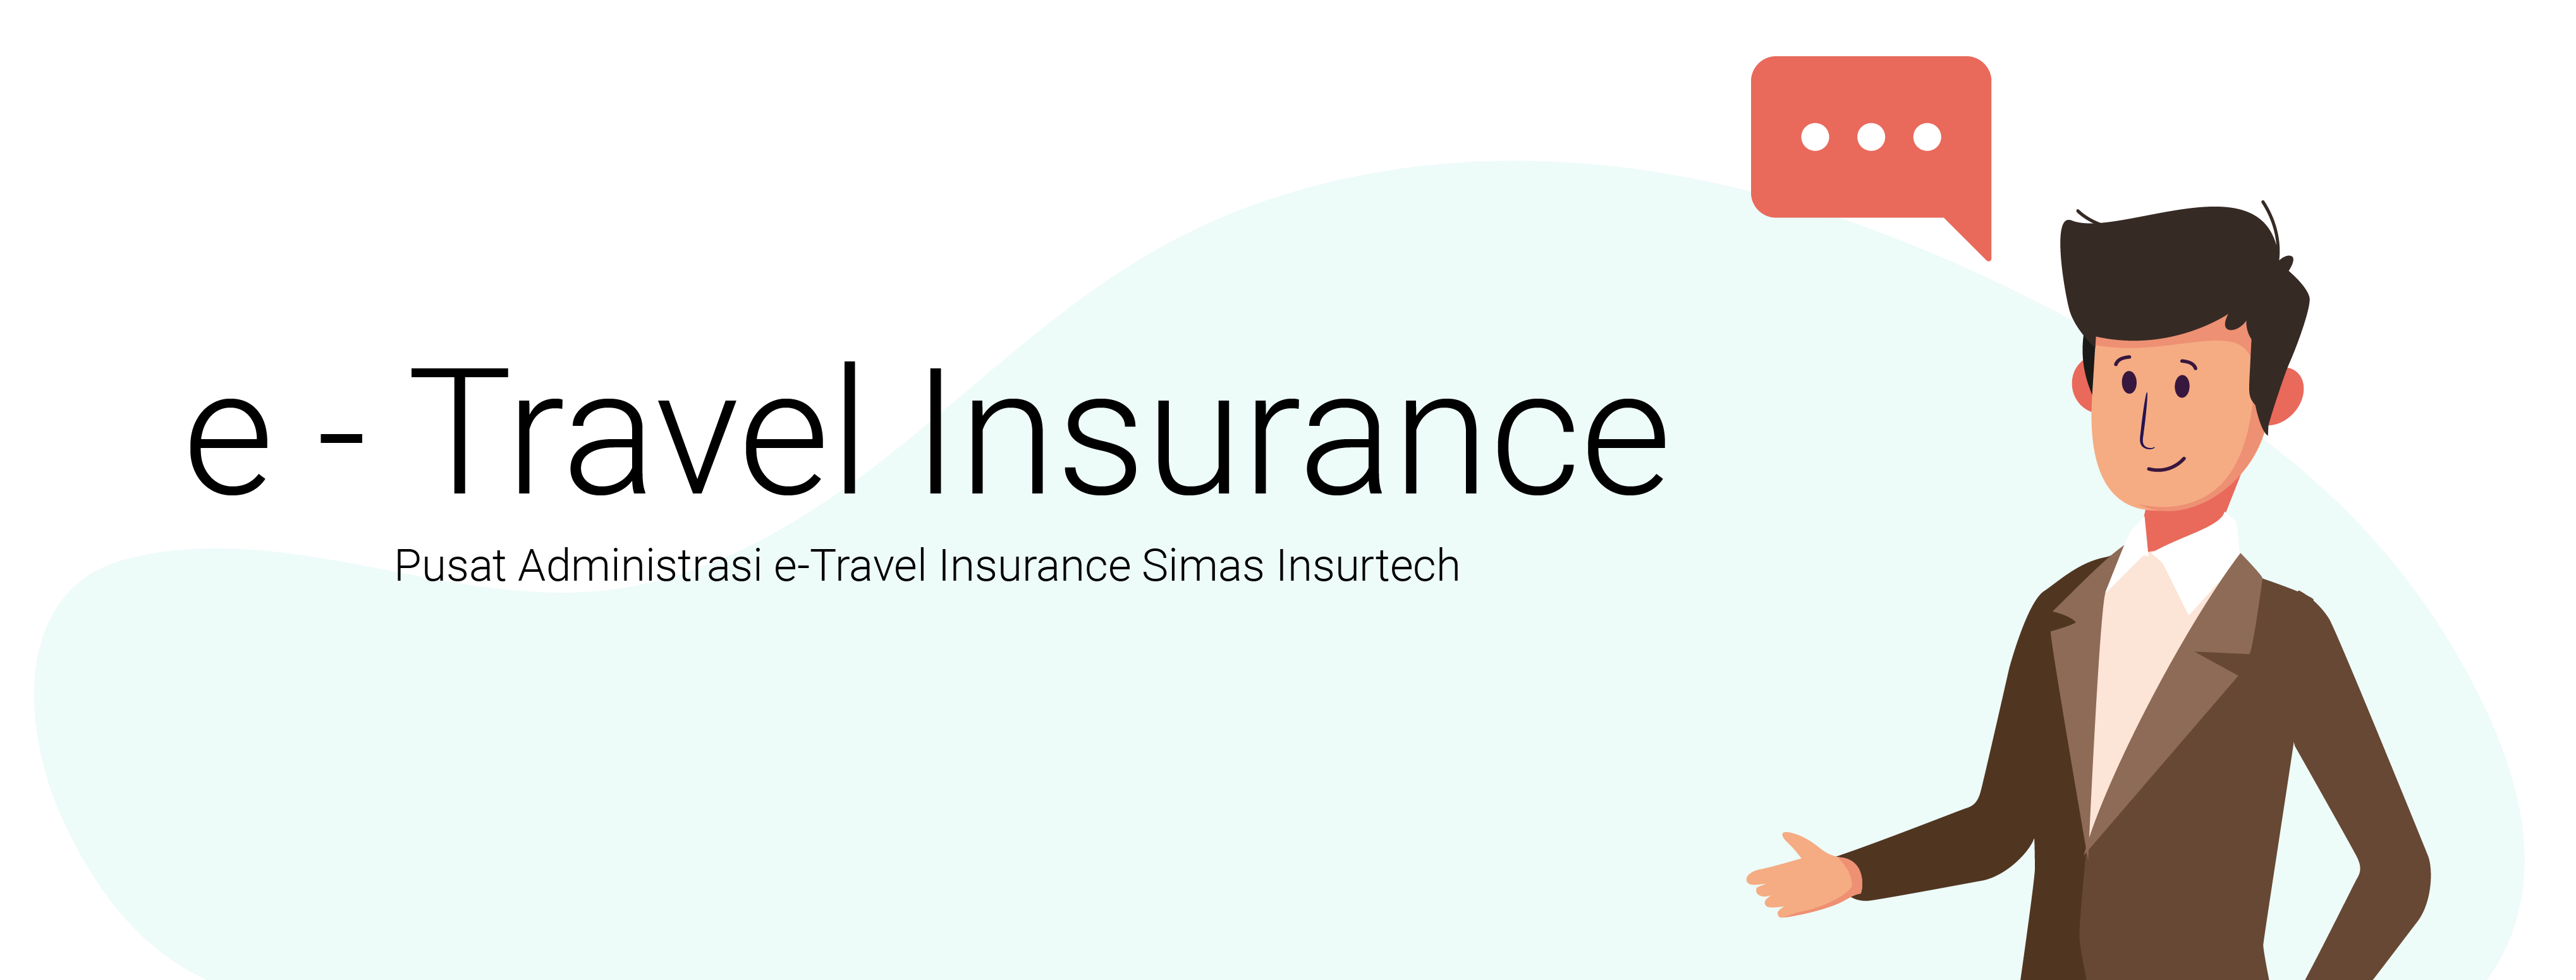 e travel insurance